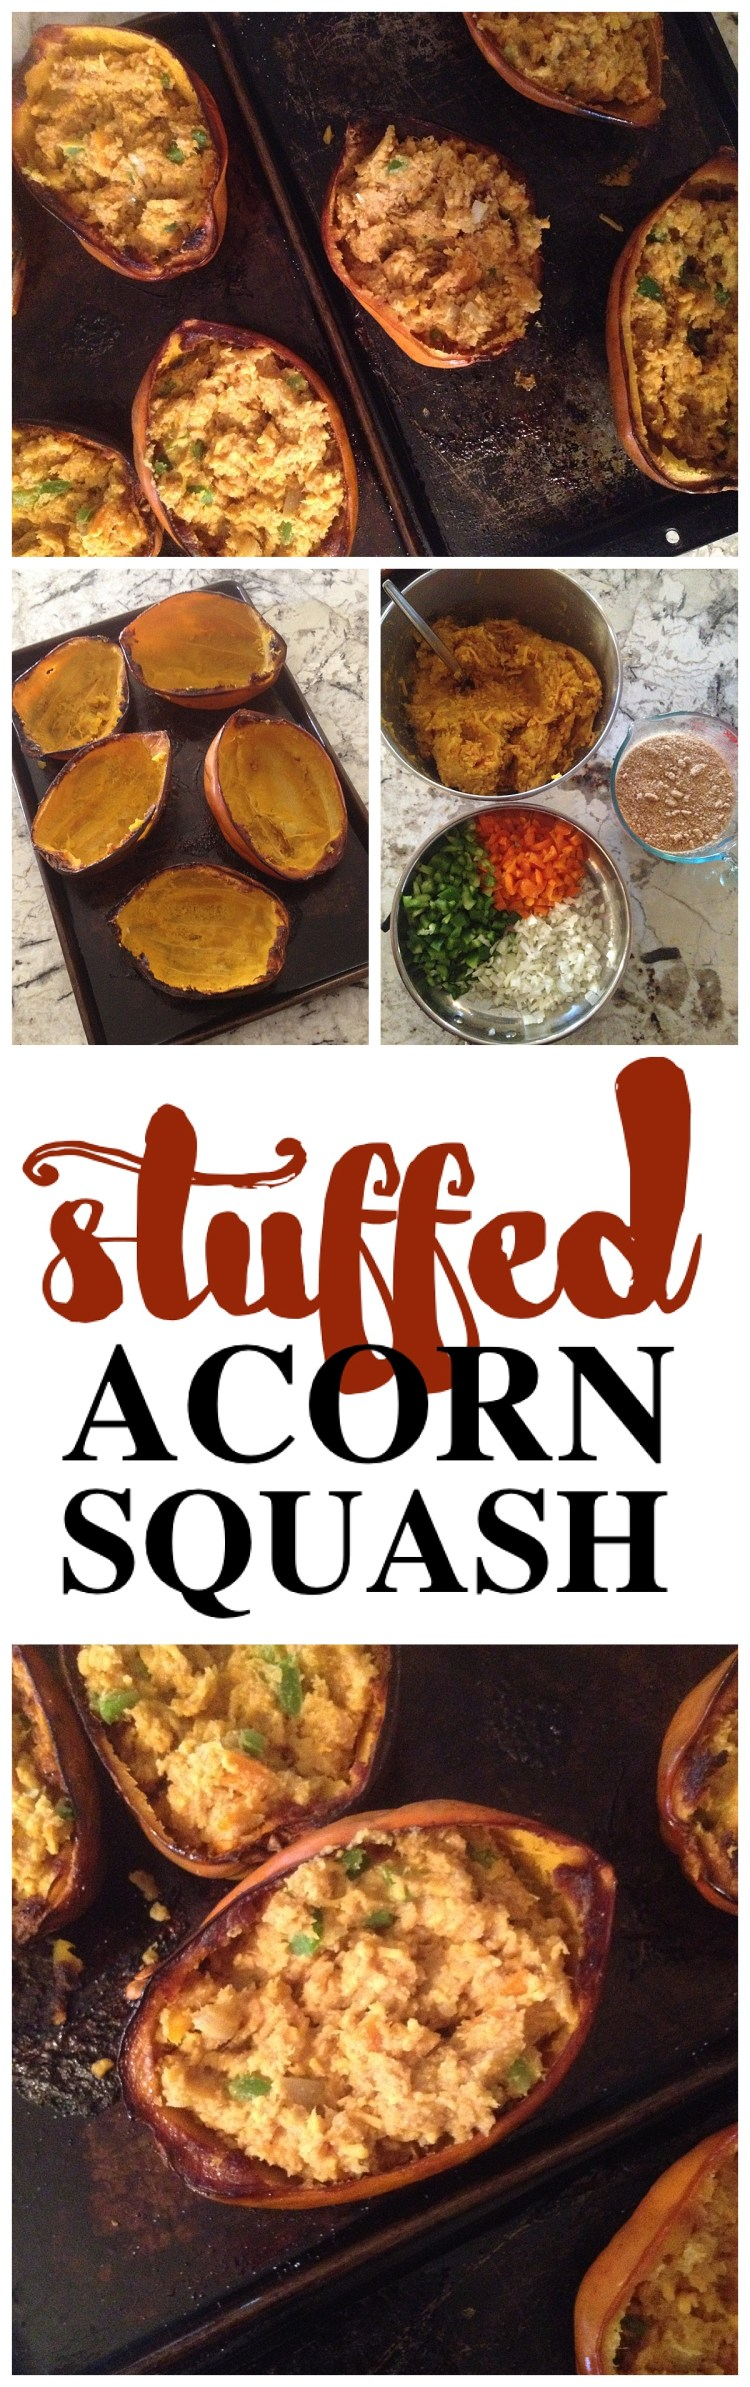 Stuffed Acorn Squash Recipe   Squash Recipes   Healthy Sides   Vegetable Recipe   Yummy Sides   Fall Food   Healthy Eating   Healthy Food   Healthy Recipe